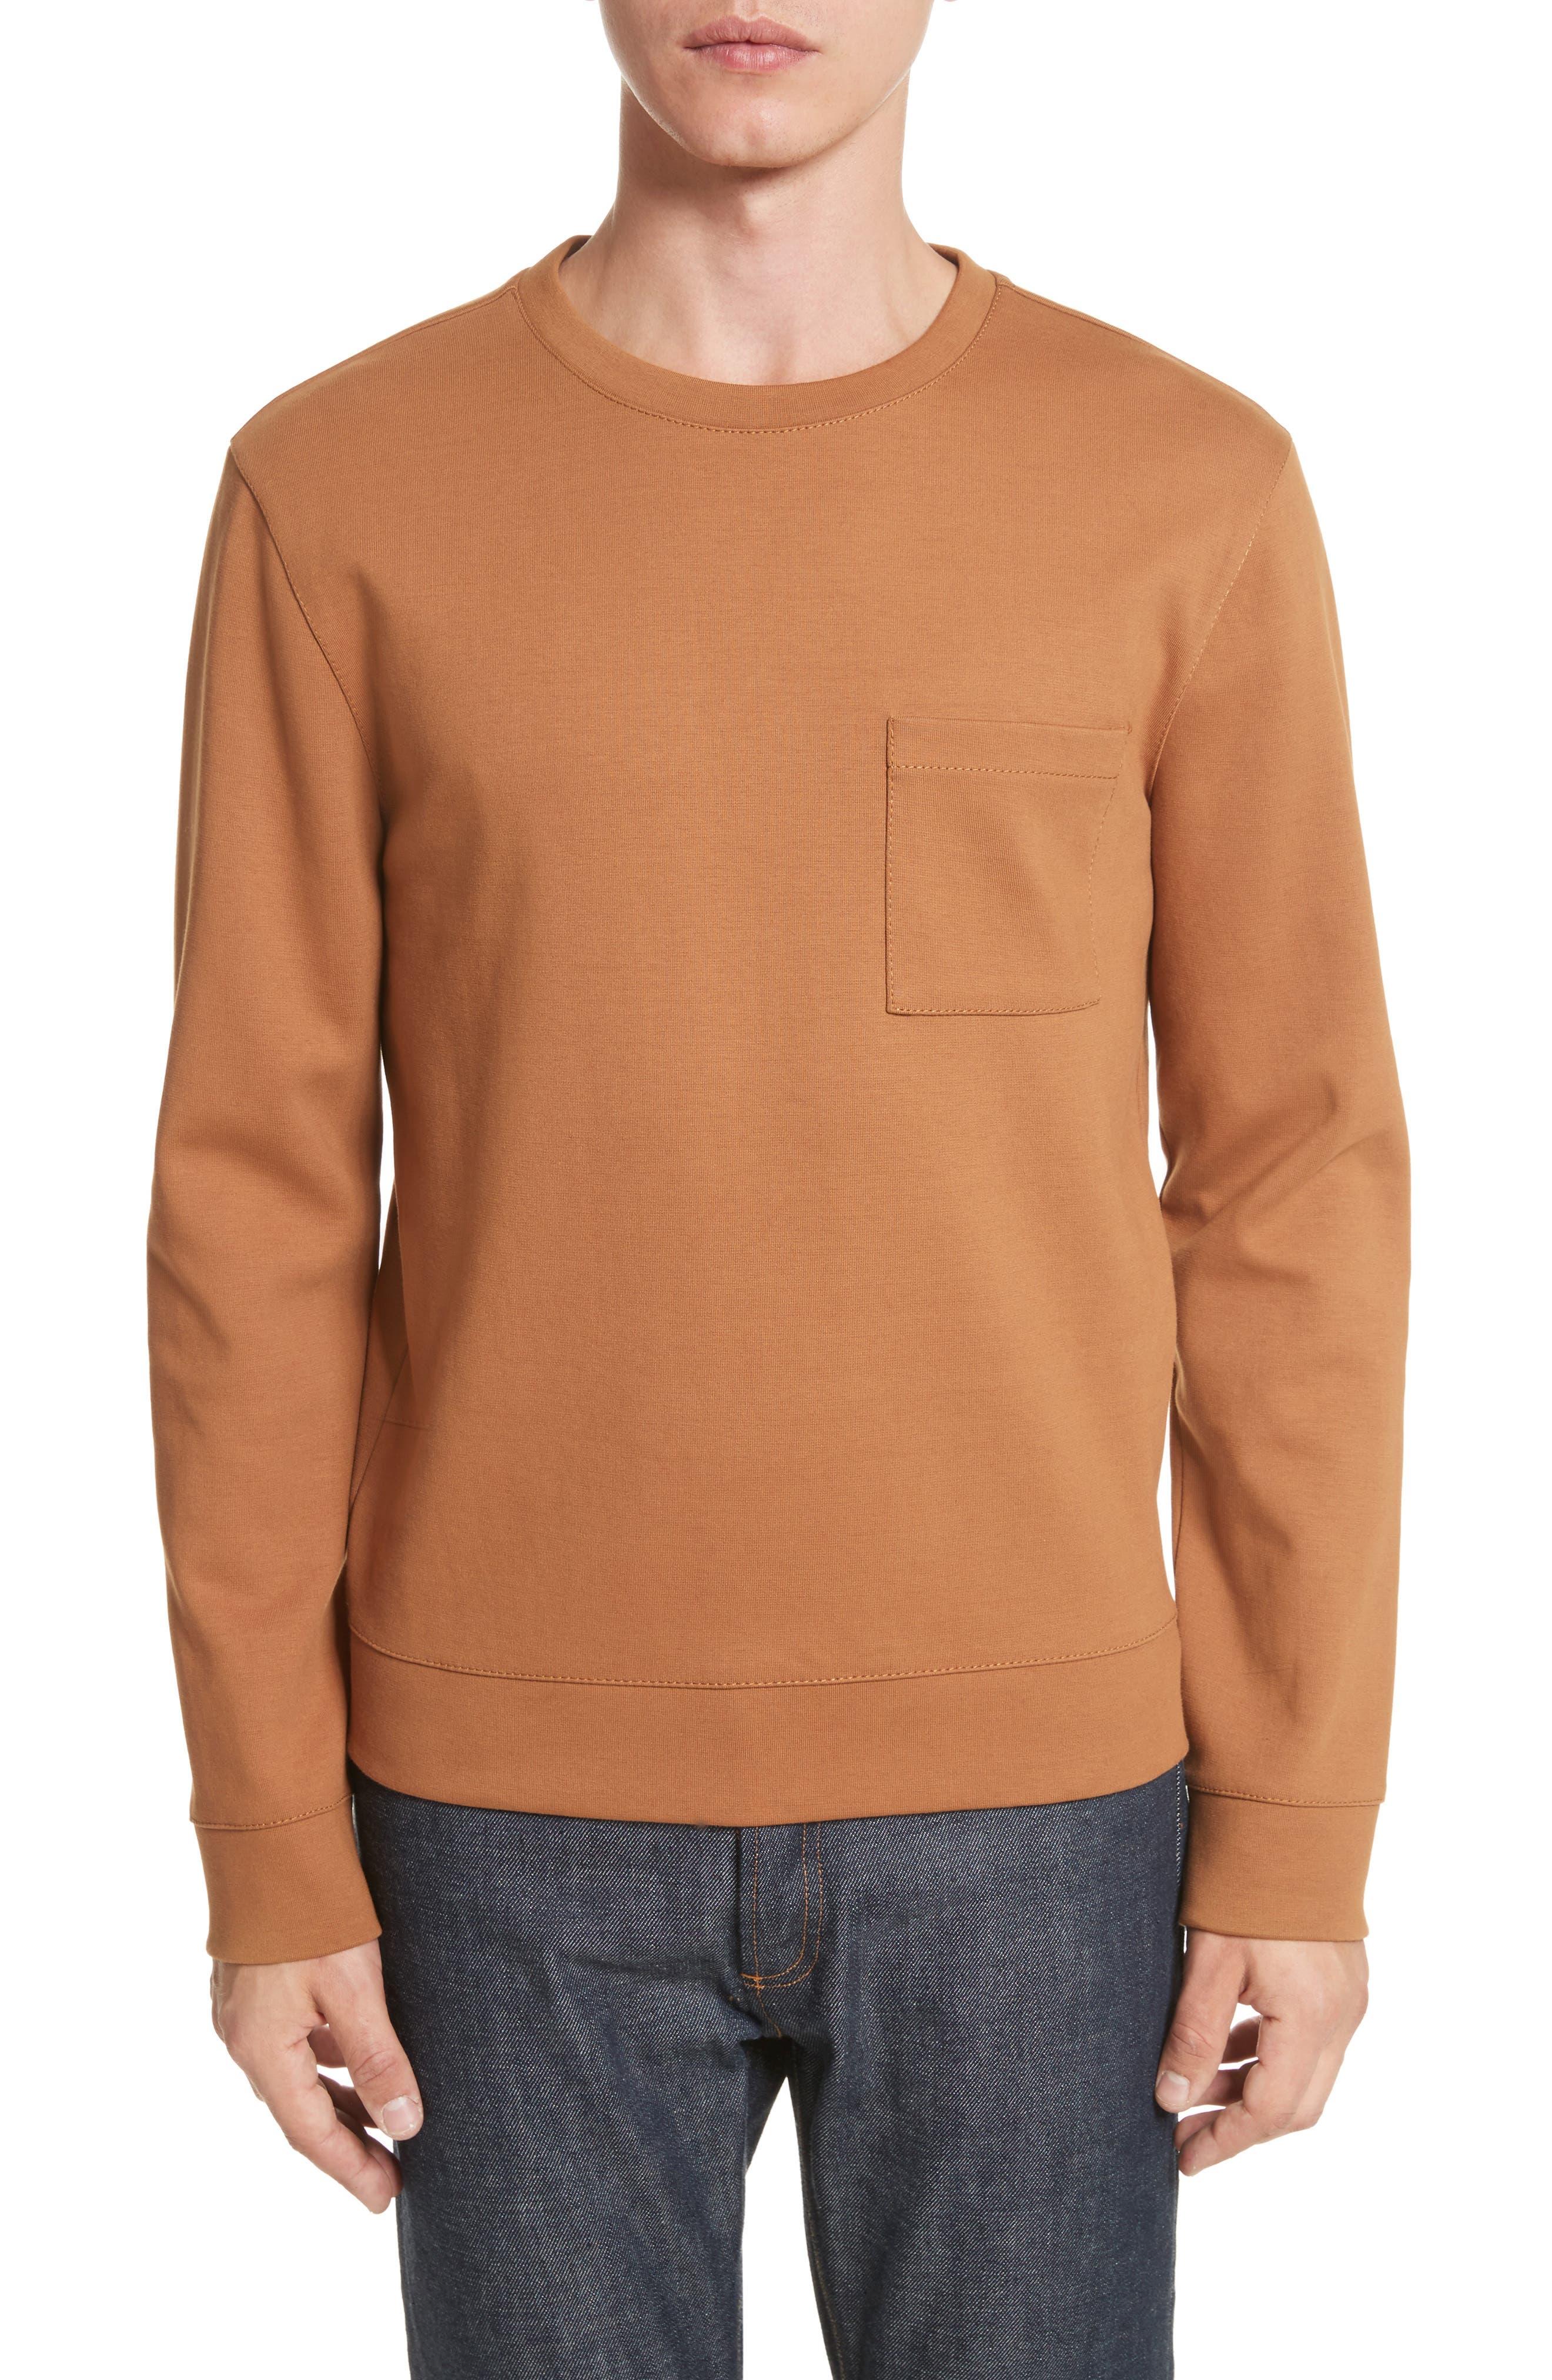 Yogi Sweatshirt,                             Main thumbnail 1, color,                             243